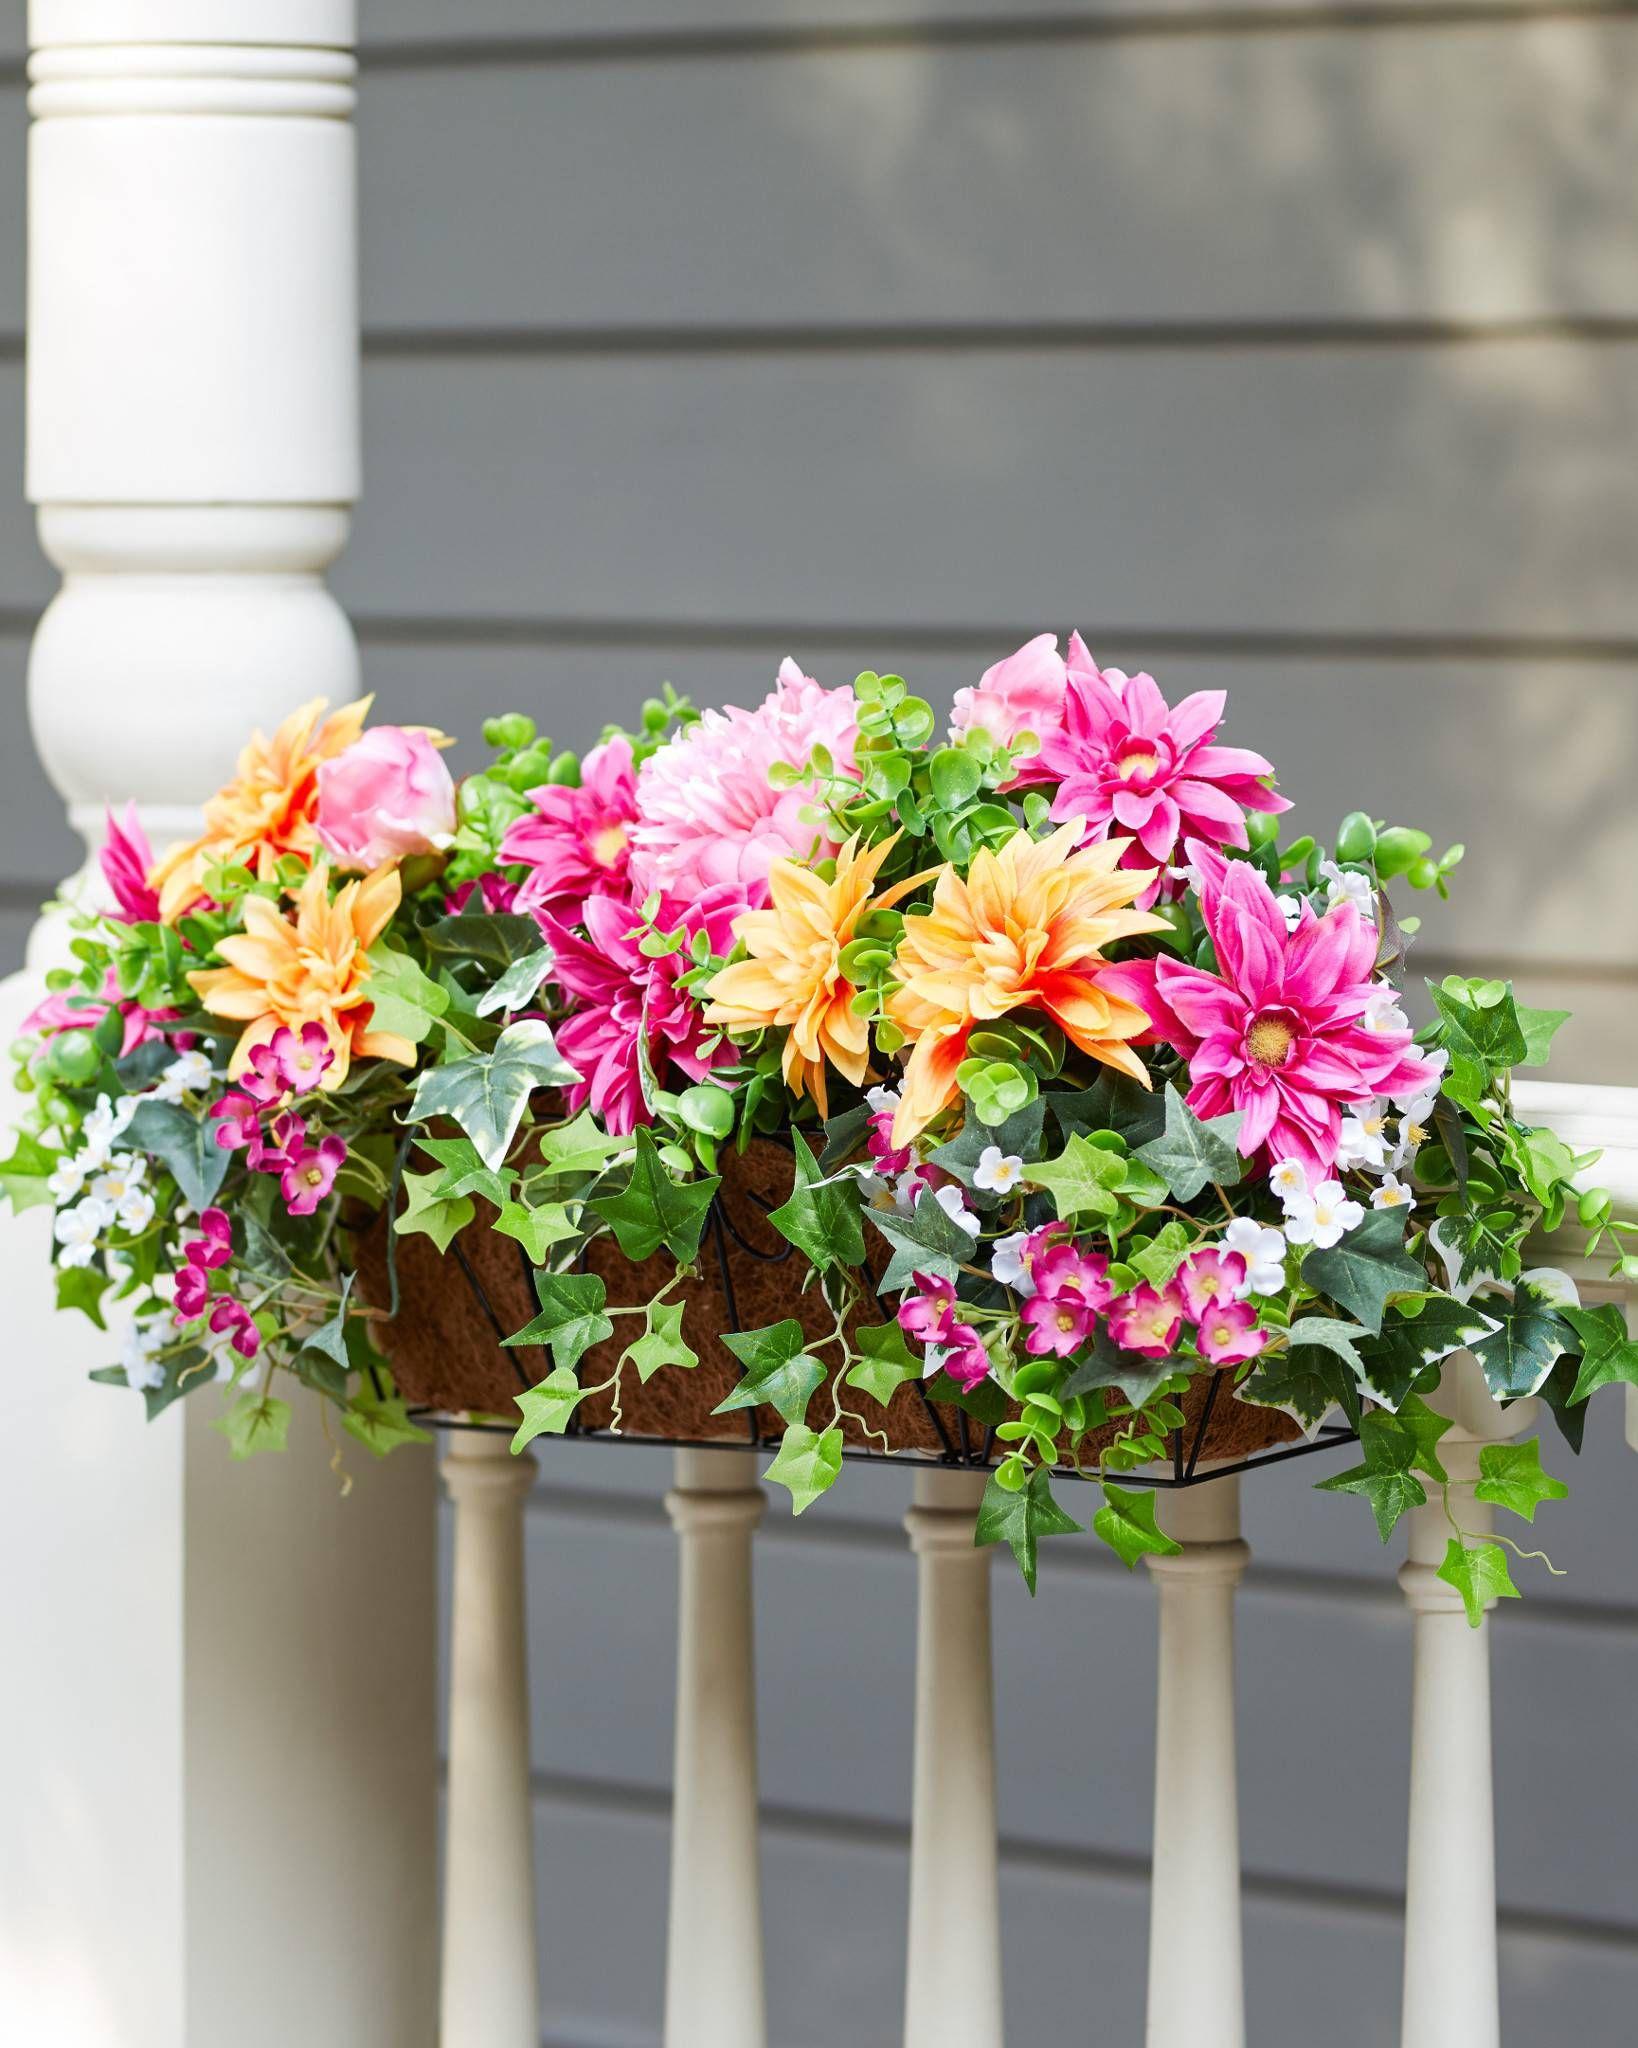 Outdoor Radiant Peony Foliage Deck Basket Flower Arrangements